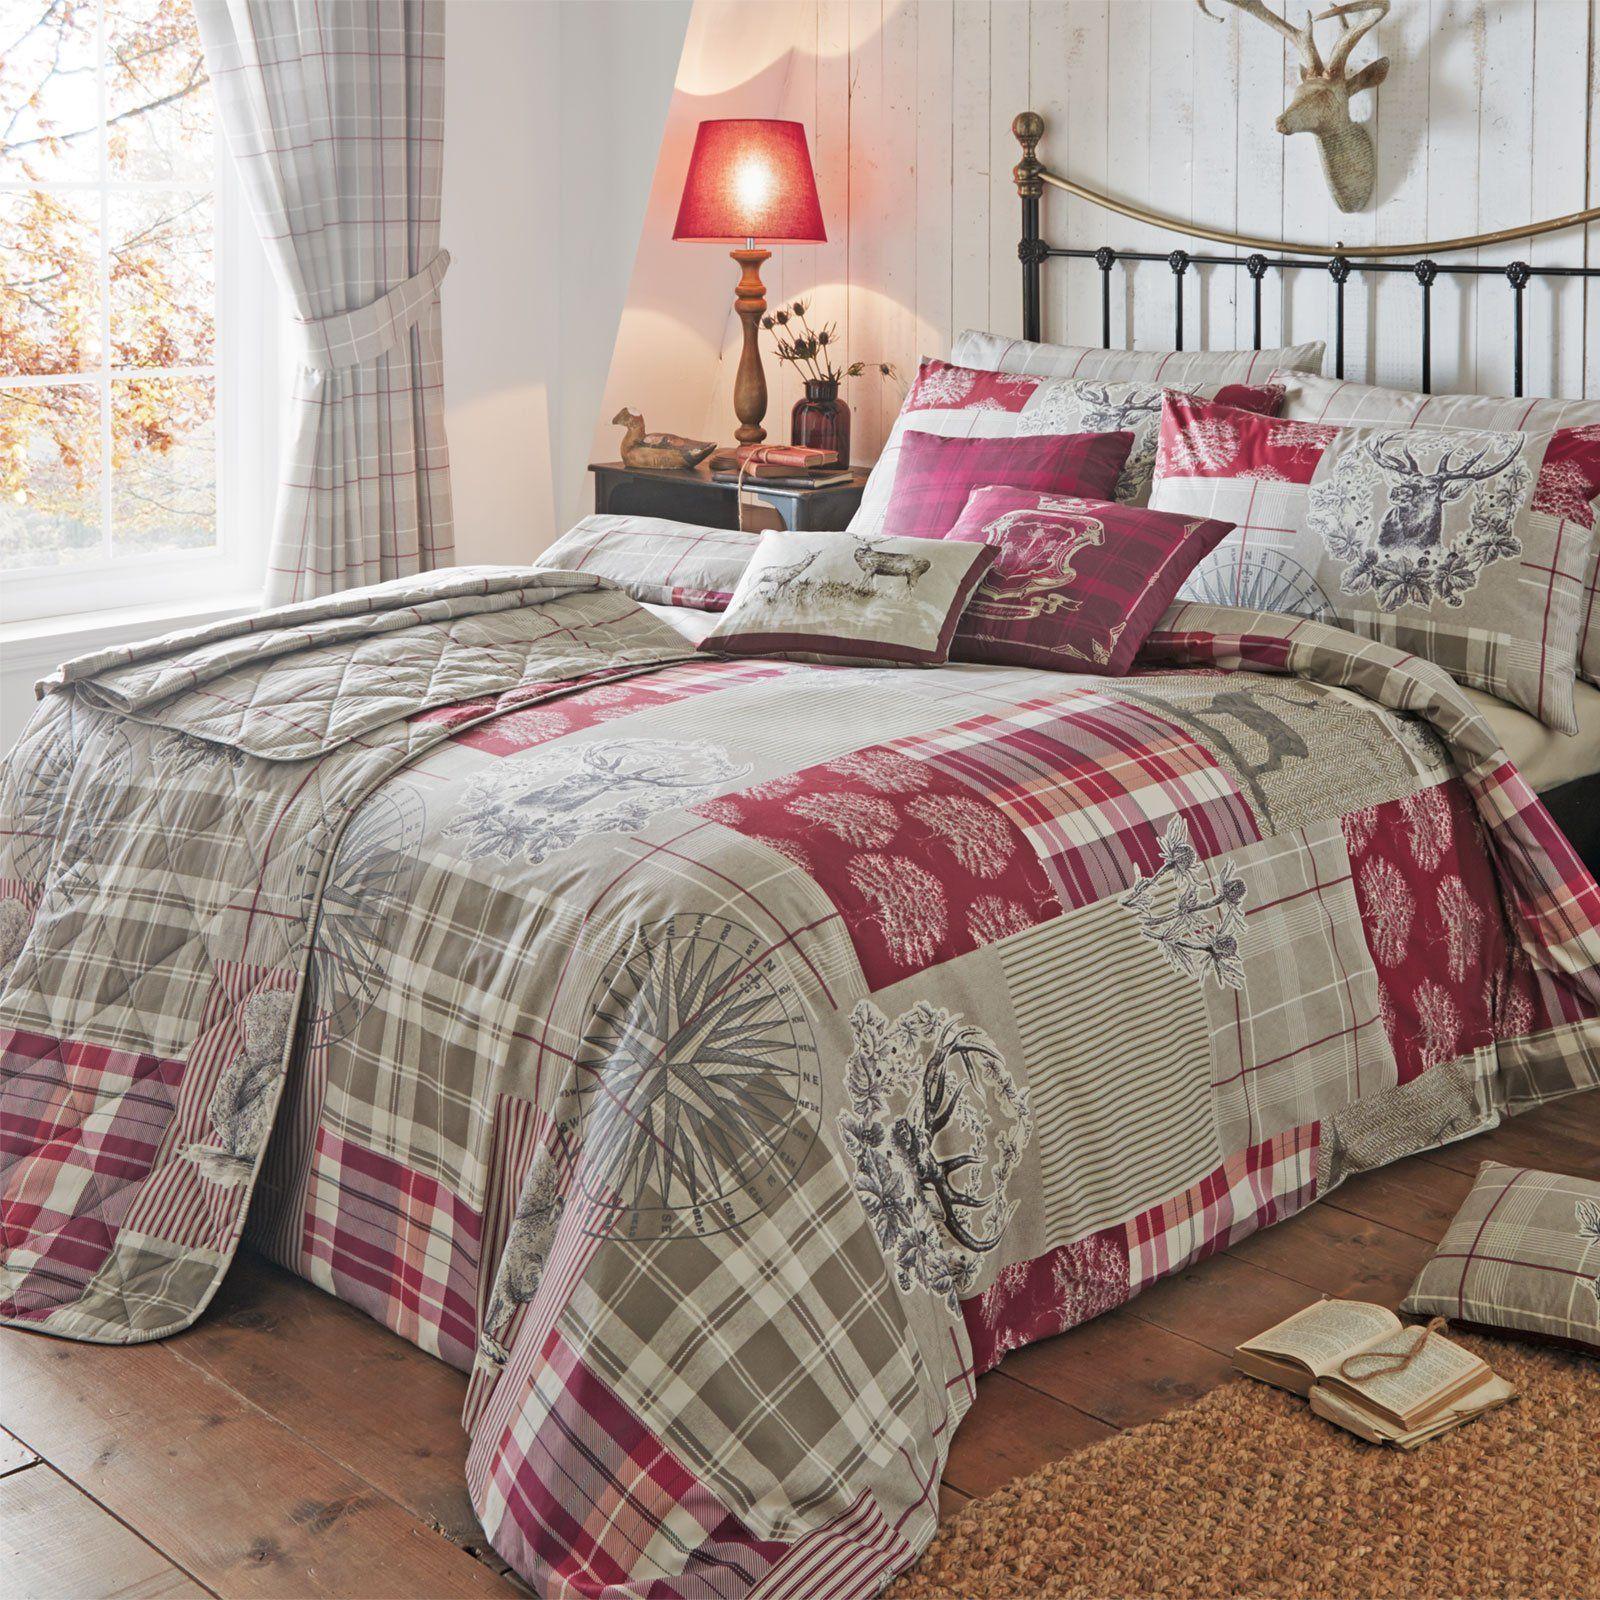 Just Contempo Double Size Country Tartan Patchwork Duvet Cover Set ... : tartan patchwork quilt - Adamdwight.com